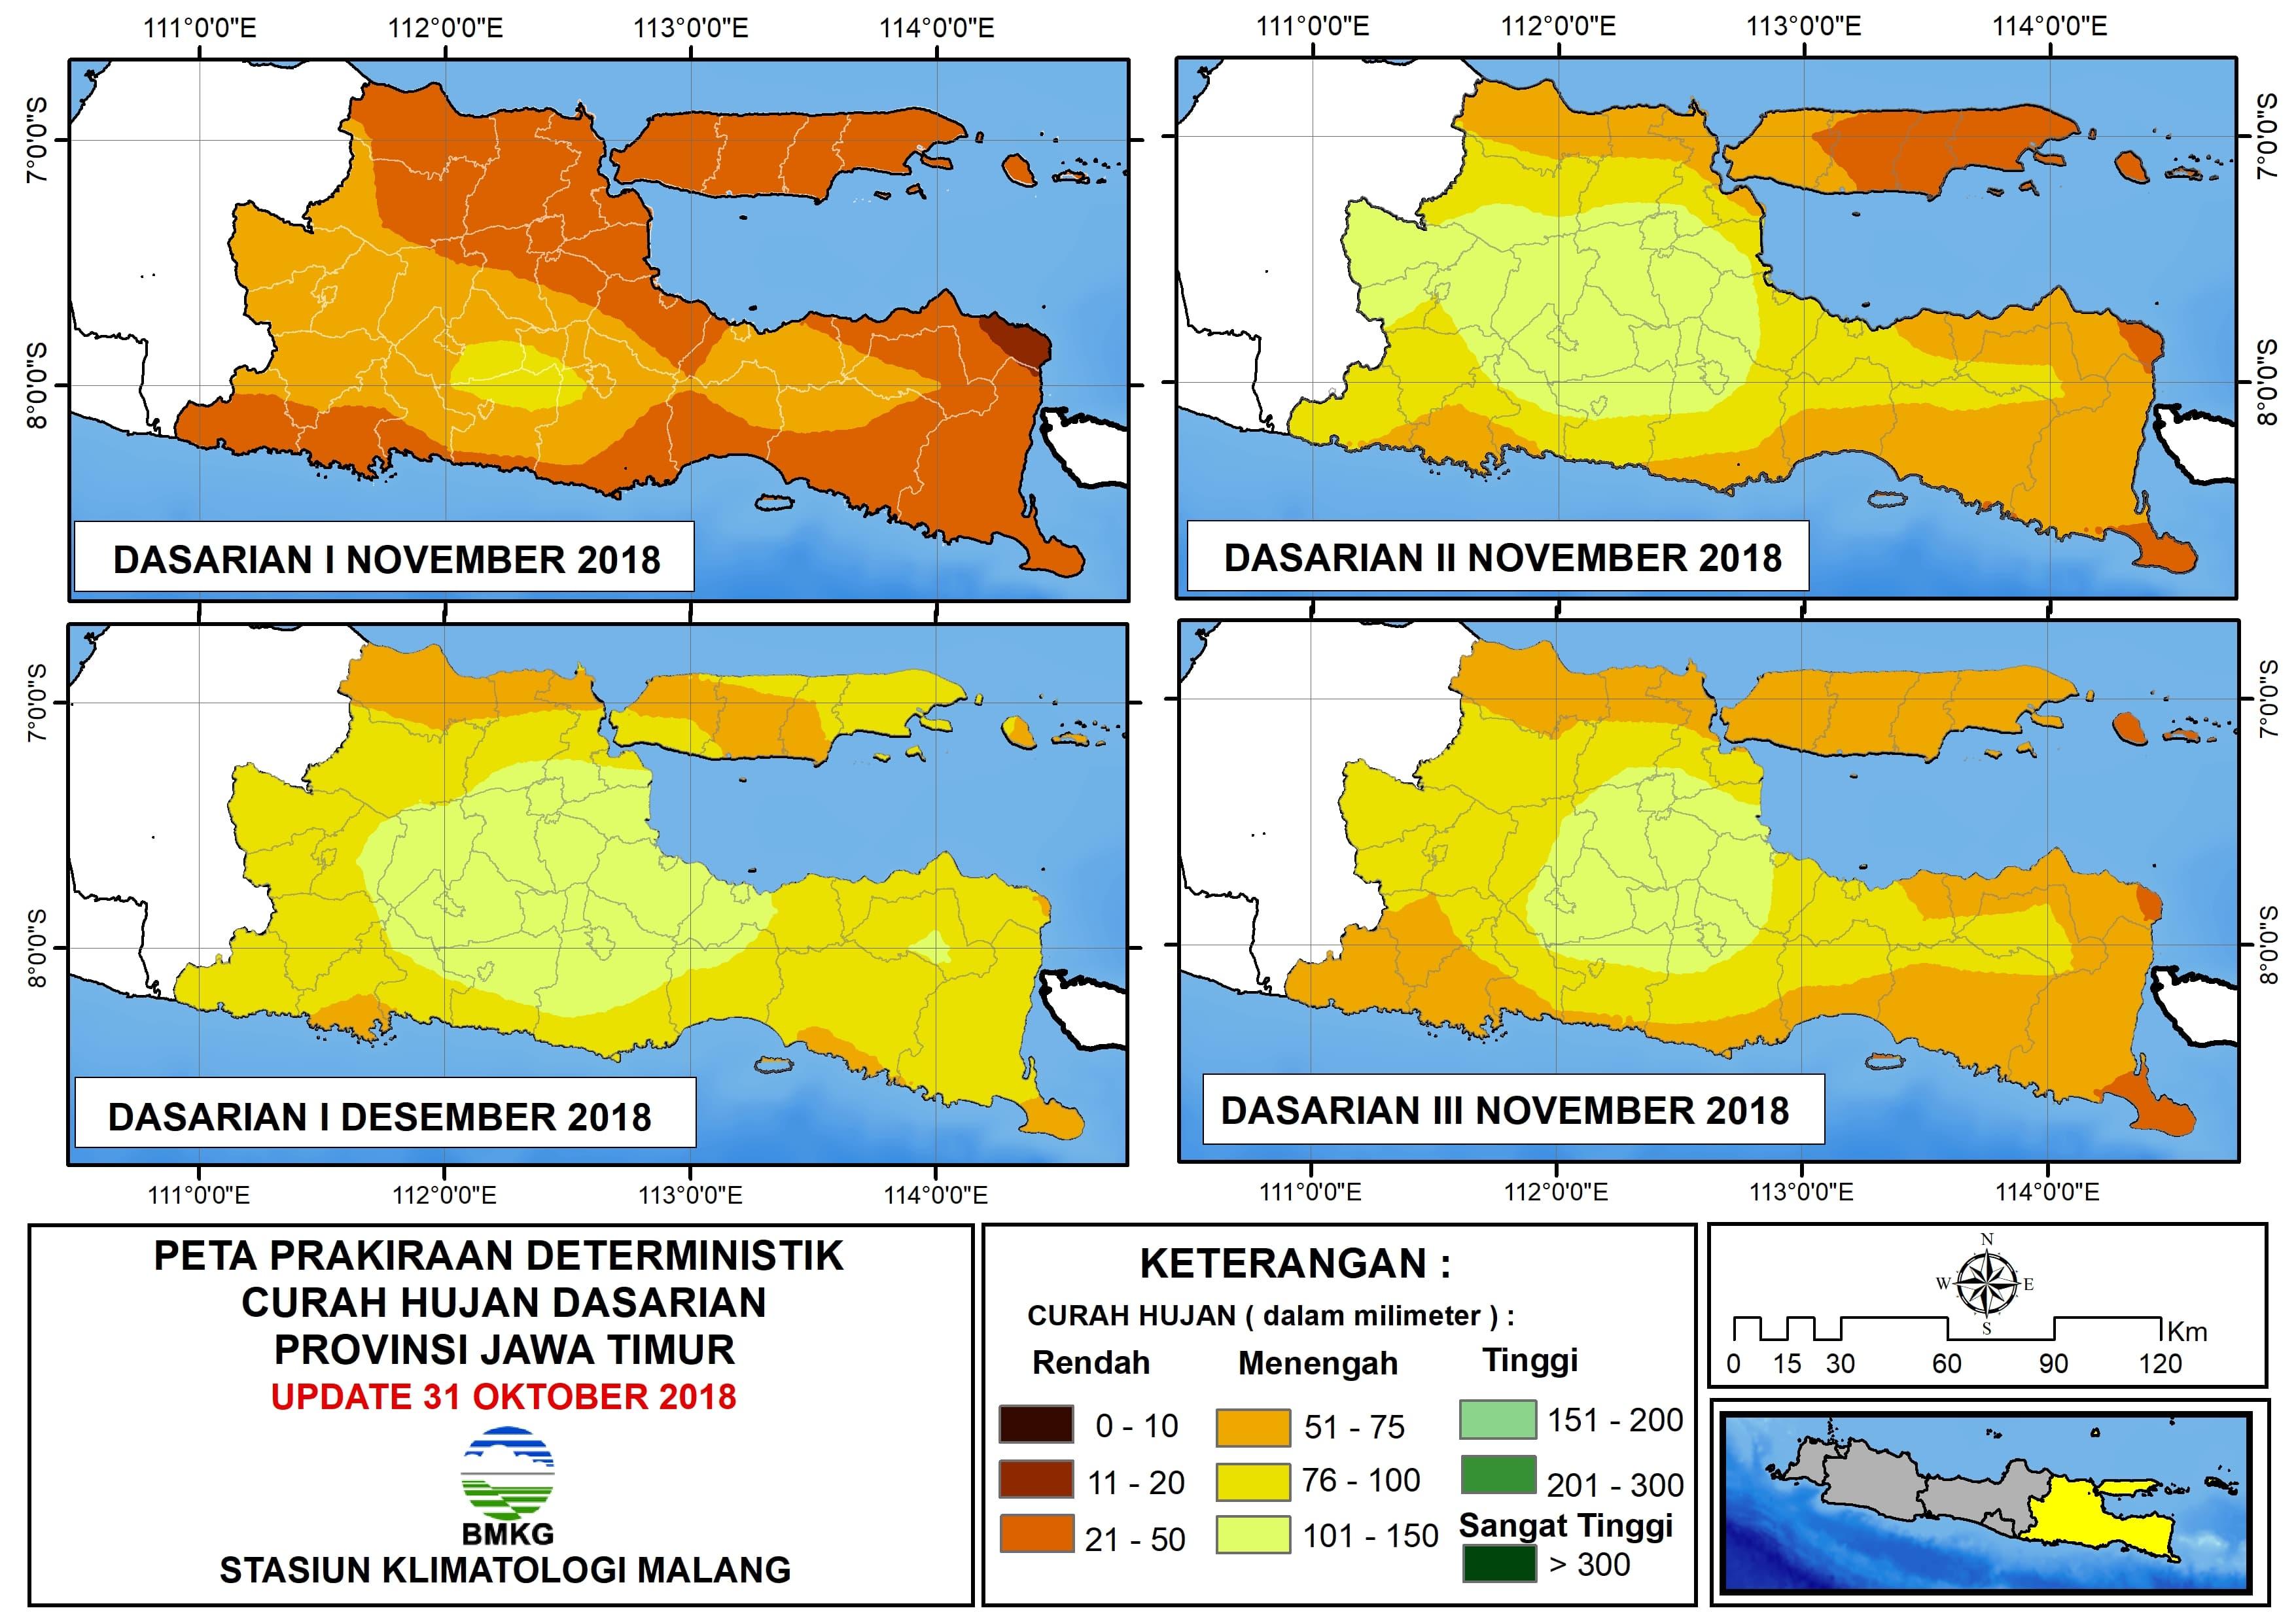 Prakiraan Deterministik Curah Hujan Dasarian Dasarian I November Provinsi Jawa Timur Update 31 Oktober 2018